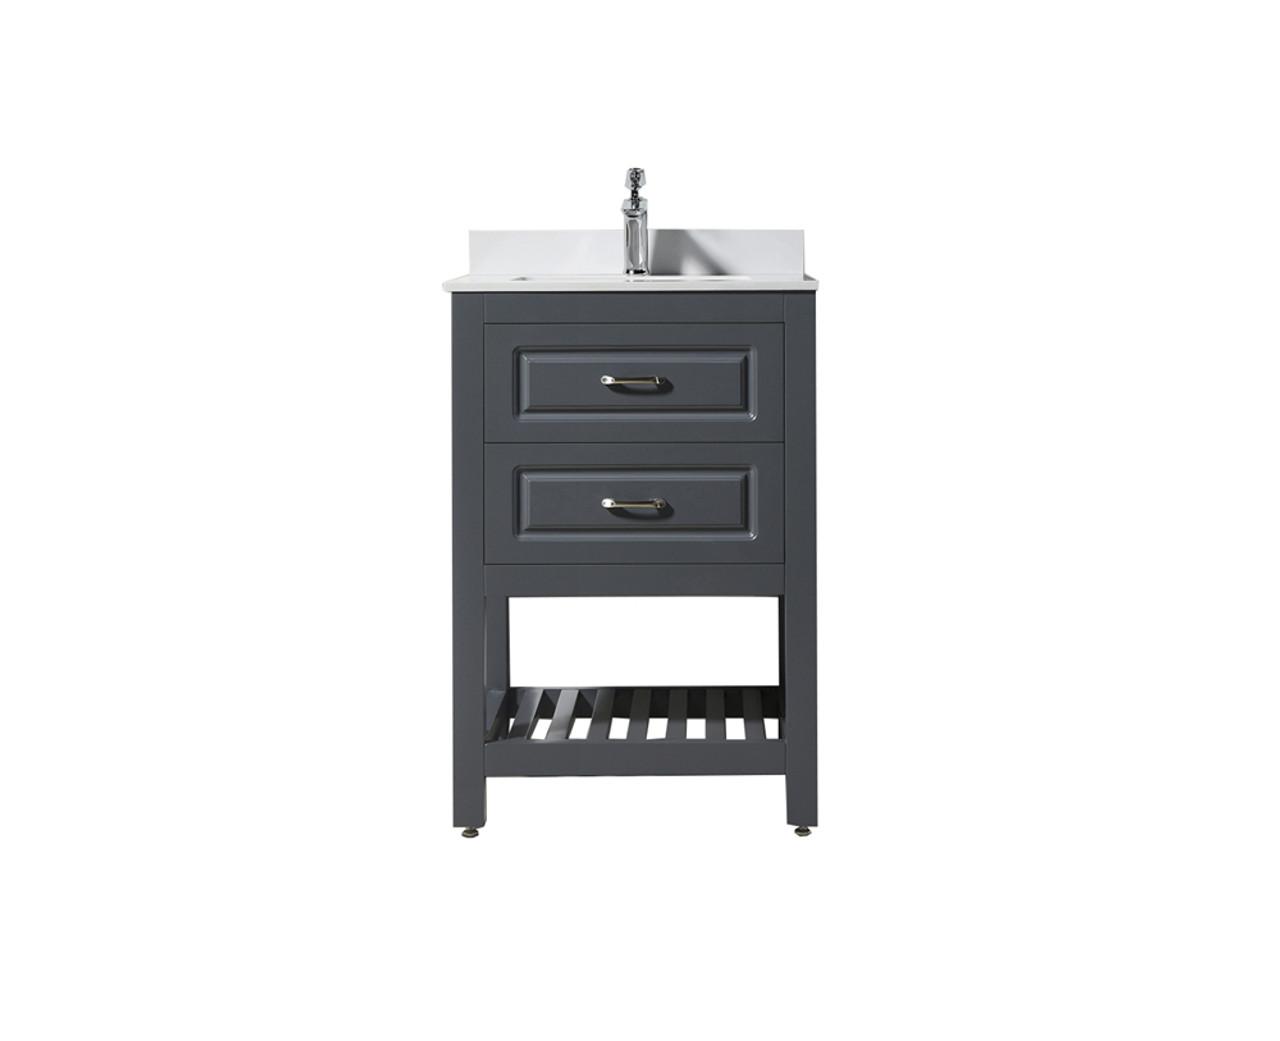 Louis 24 Vanity With White Quartz Top And Ceramic Sink